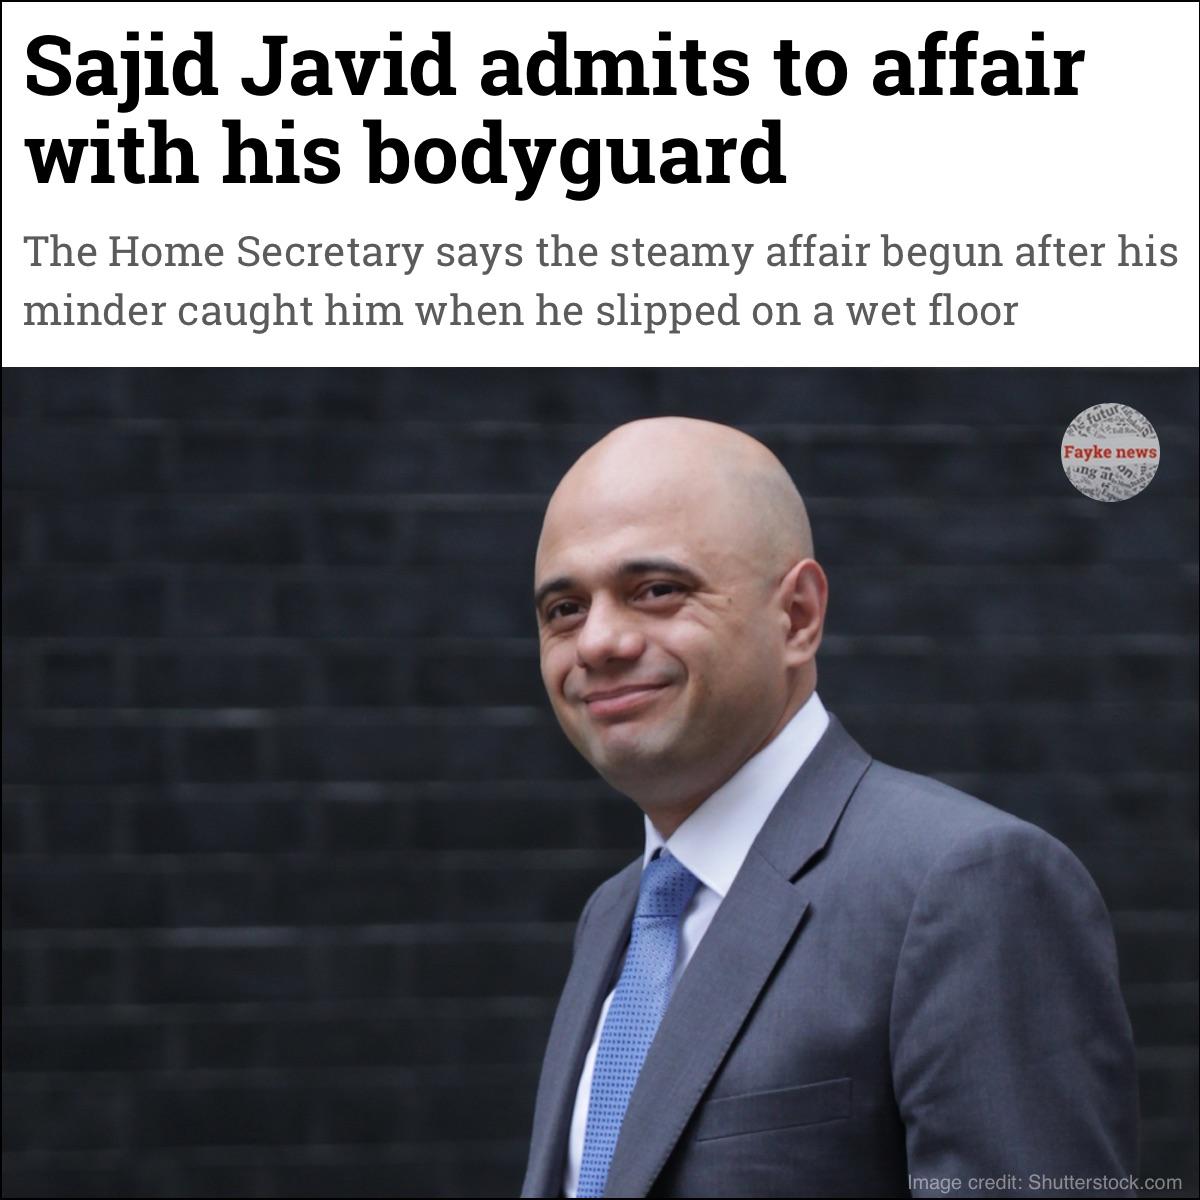 Sajid Javid Fakew News Satire Meme Fayke News